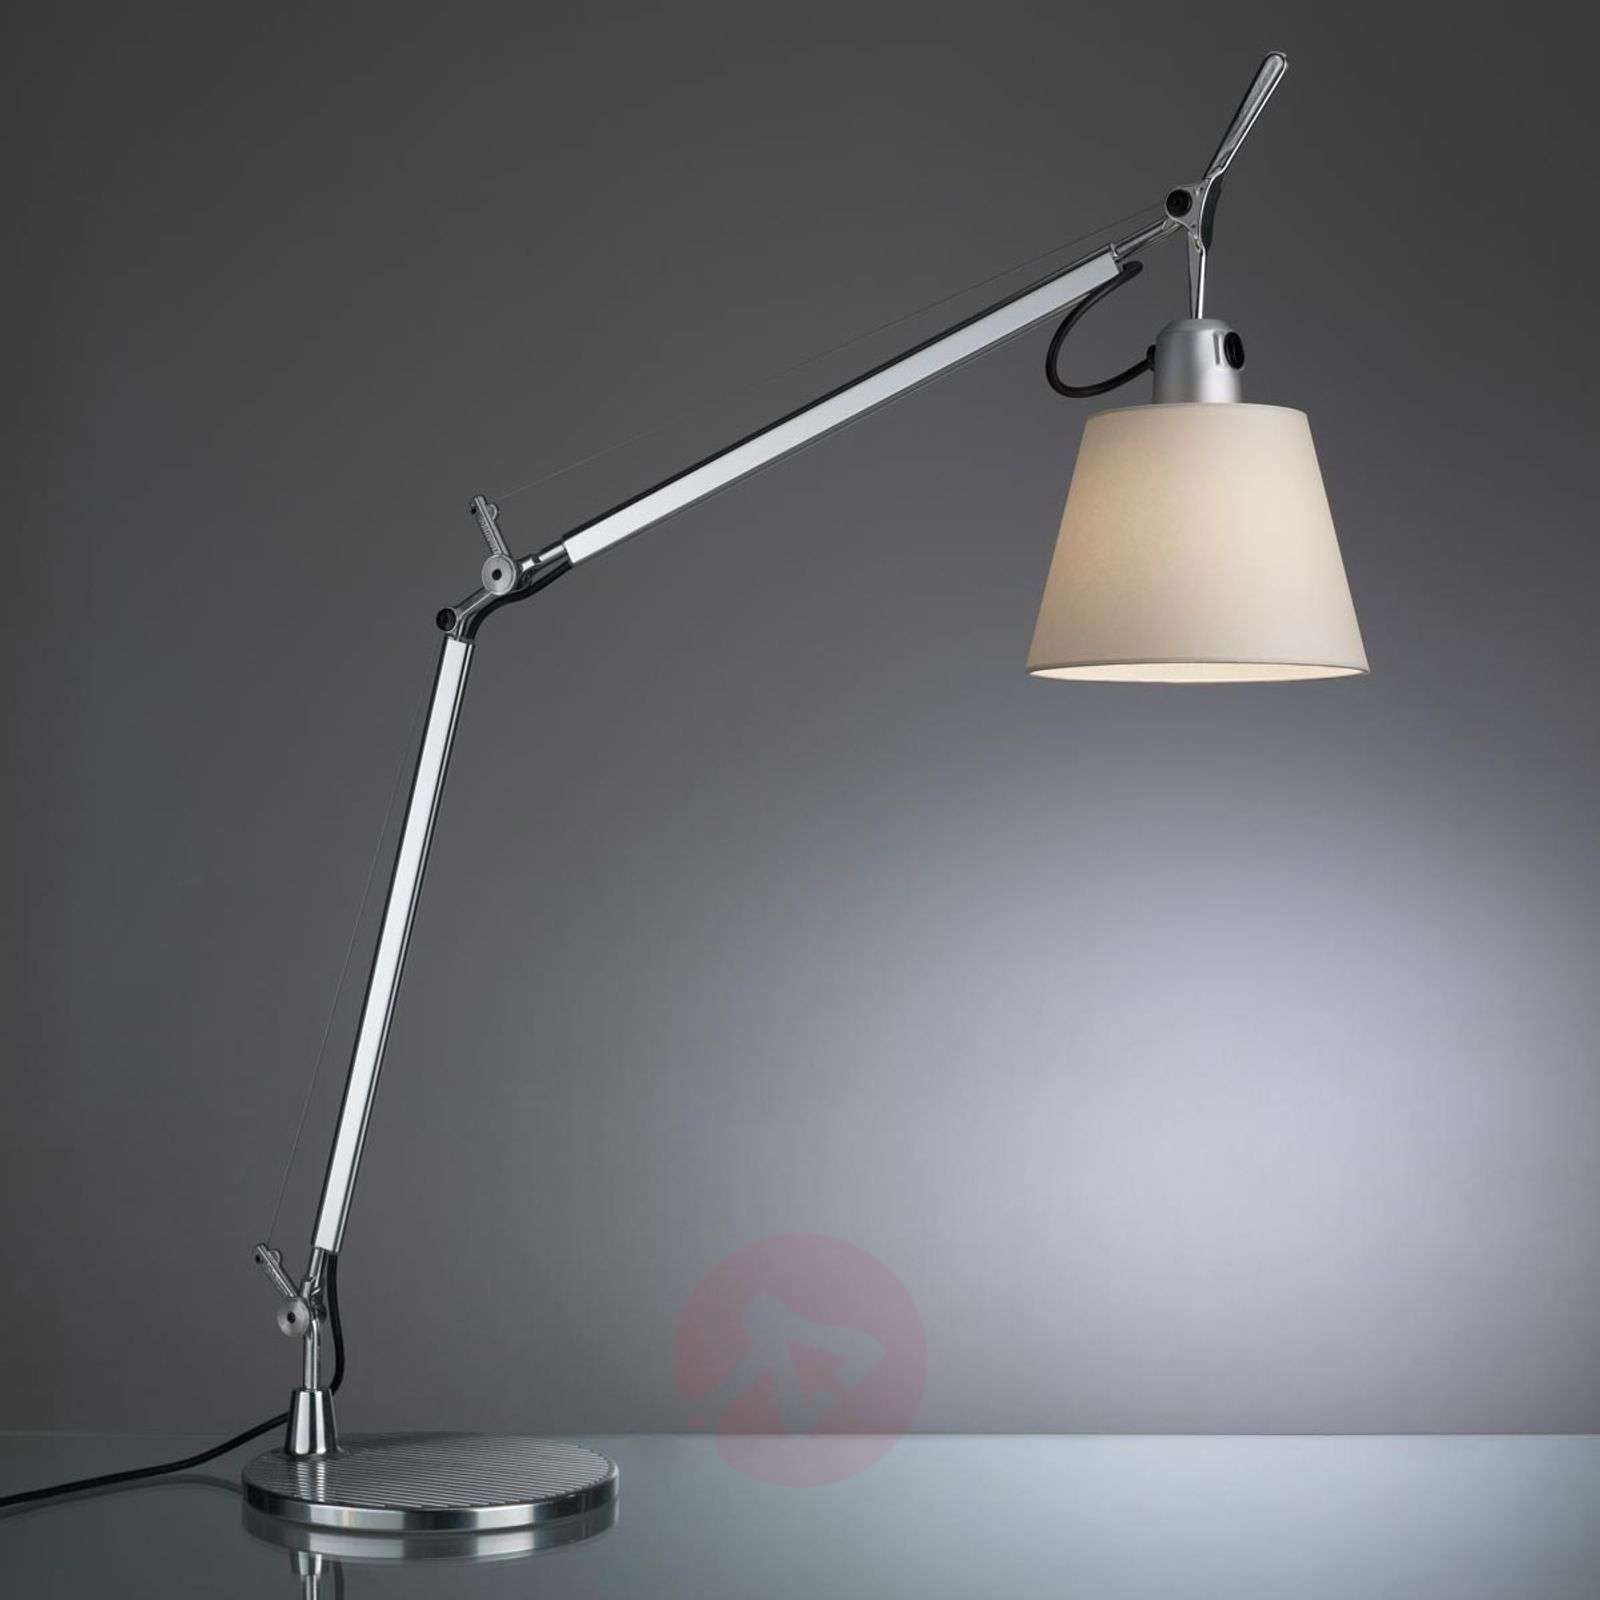 Design-pöytävalaisin Tolomeo Basculante-1060089-01